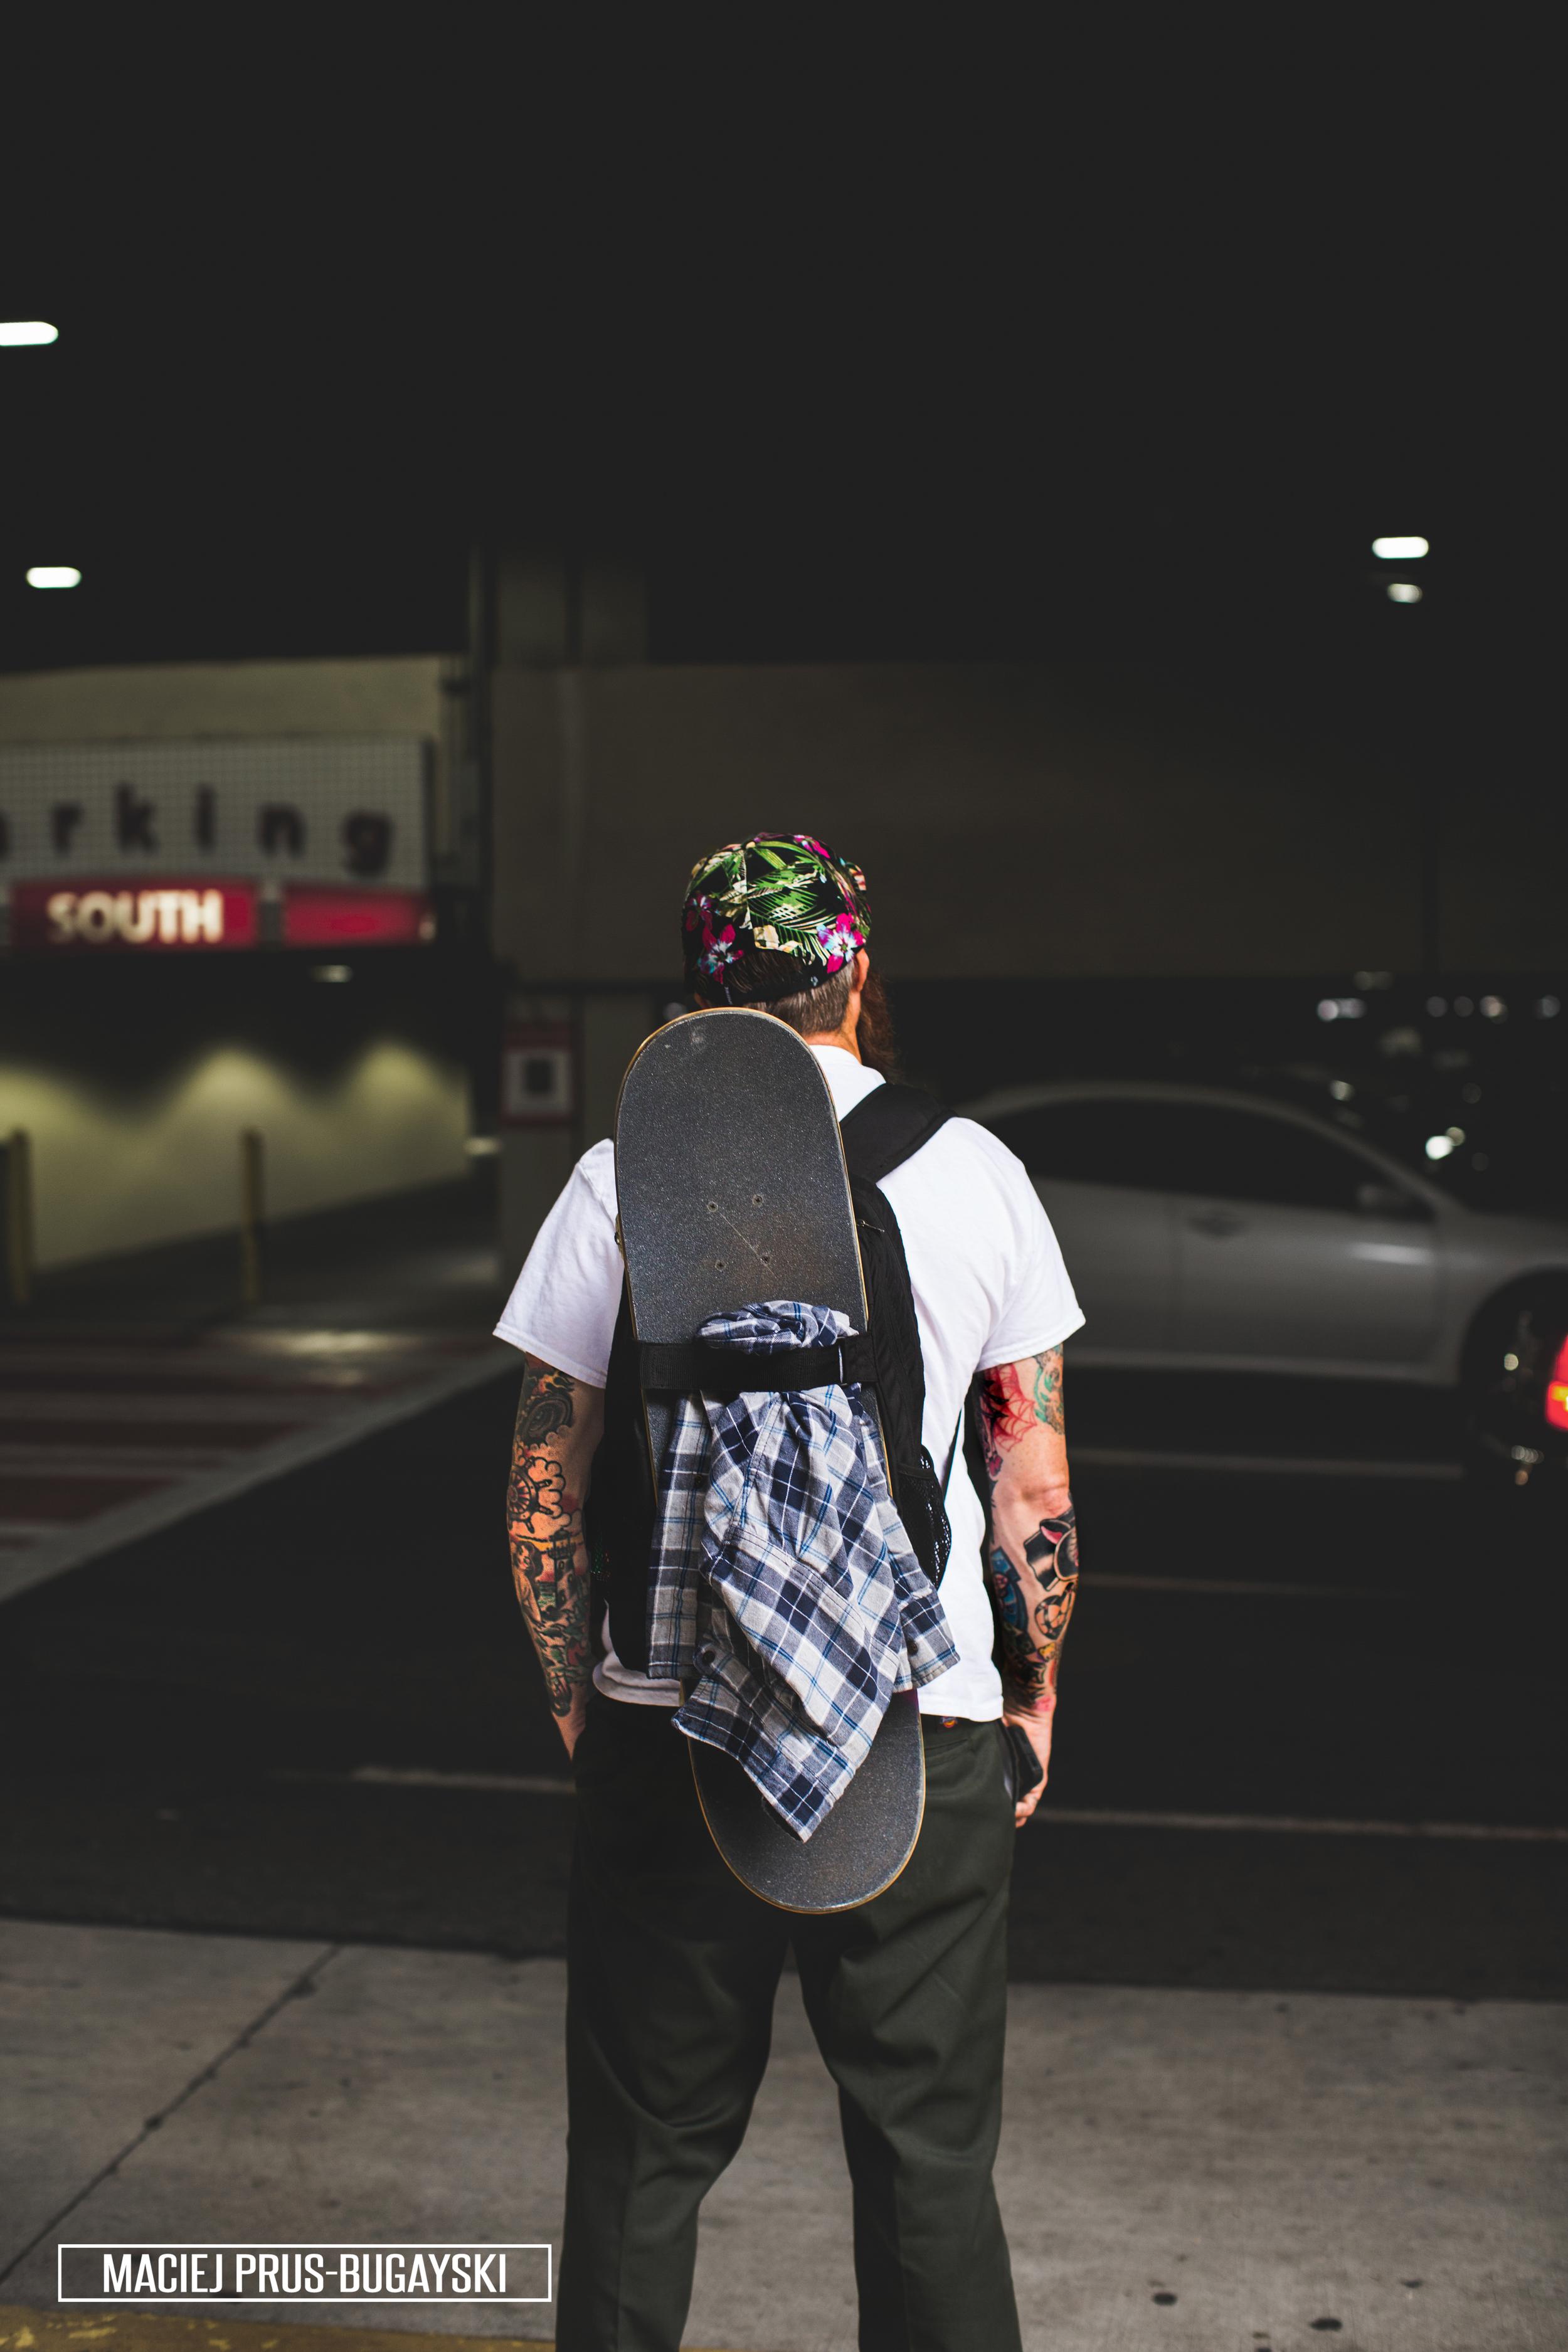 skateboard dude.jpg